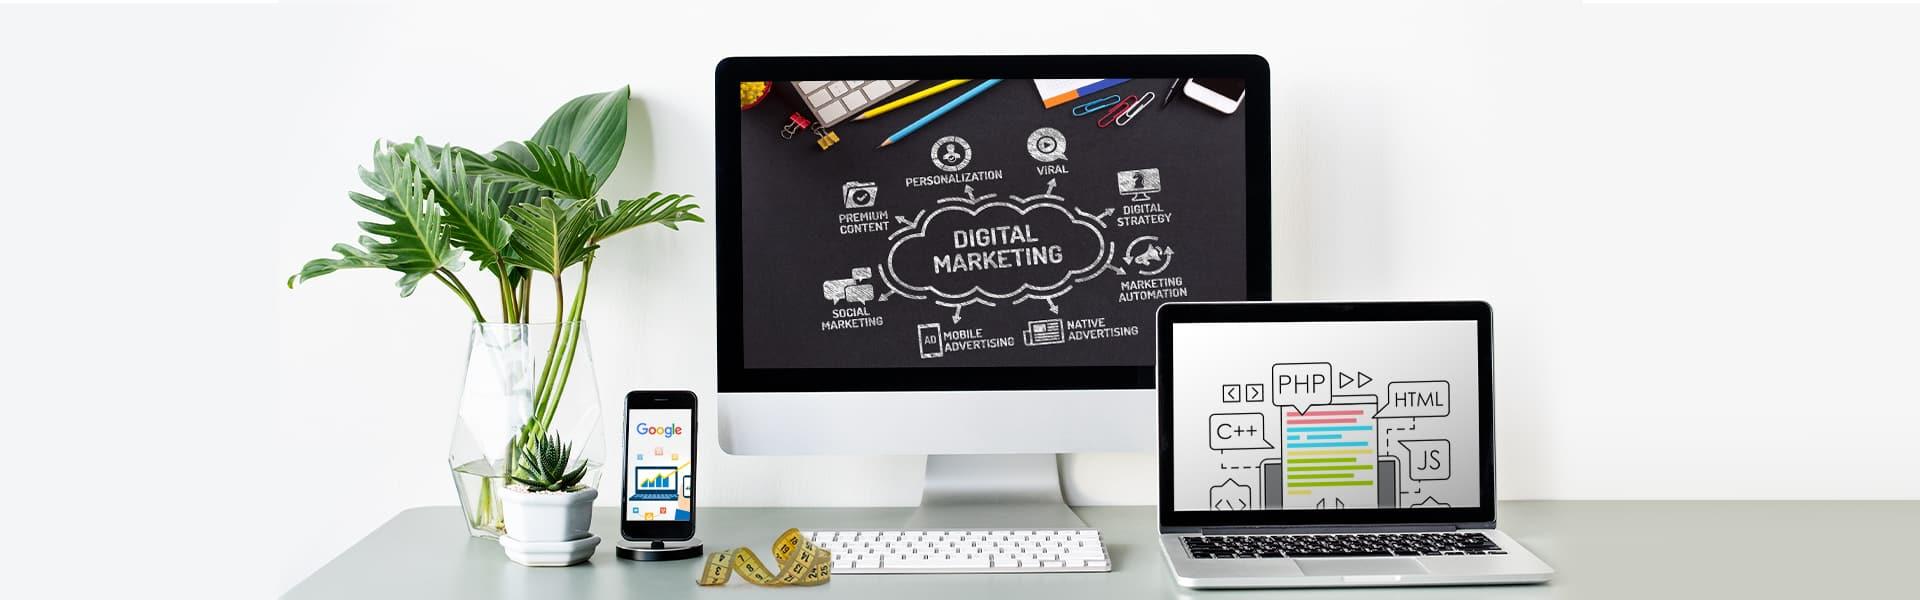 HomePage-IMPRIMIS: la tua sartoria digitale